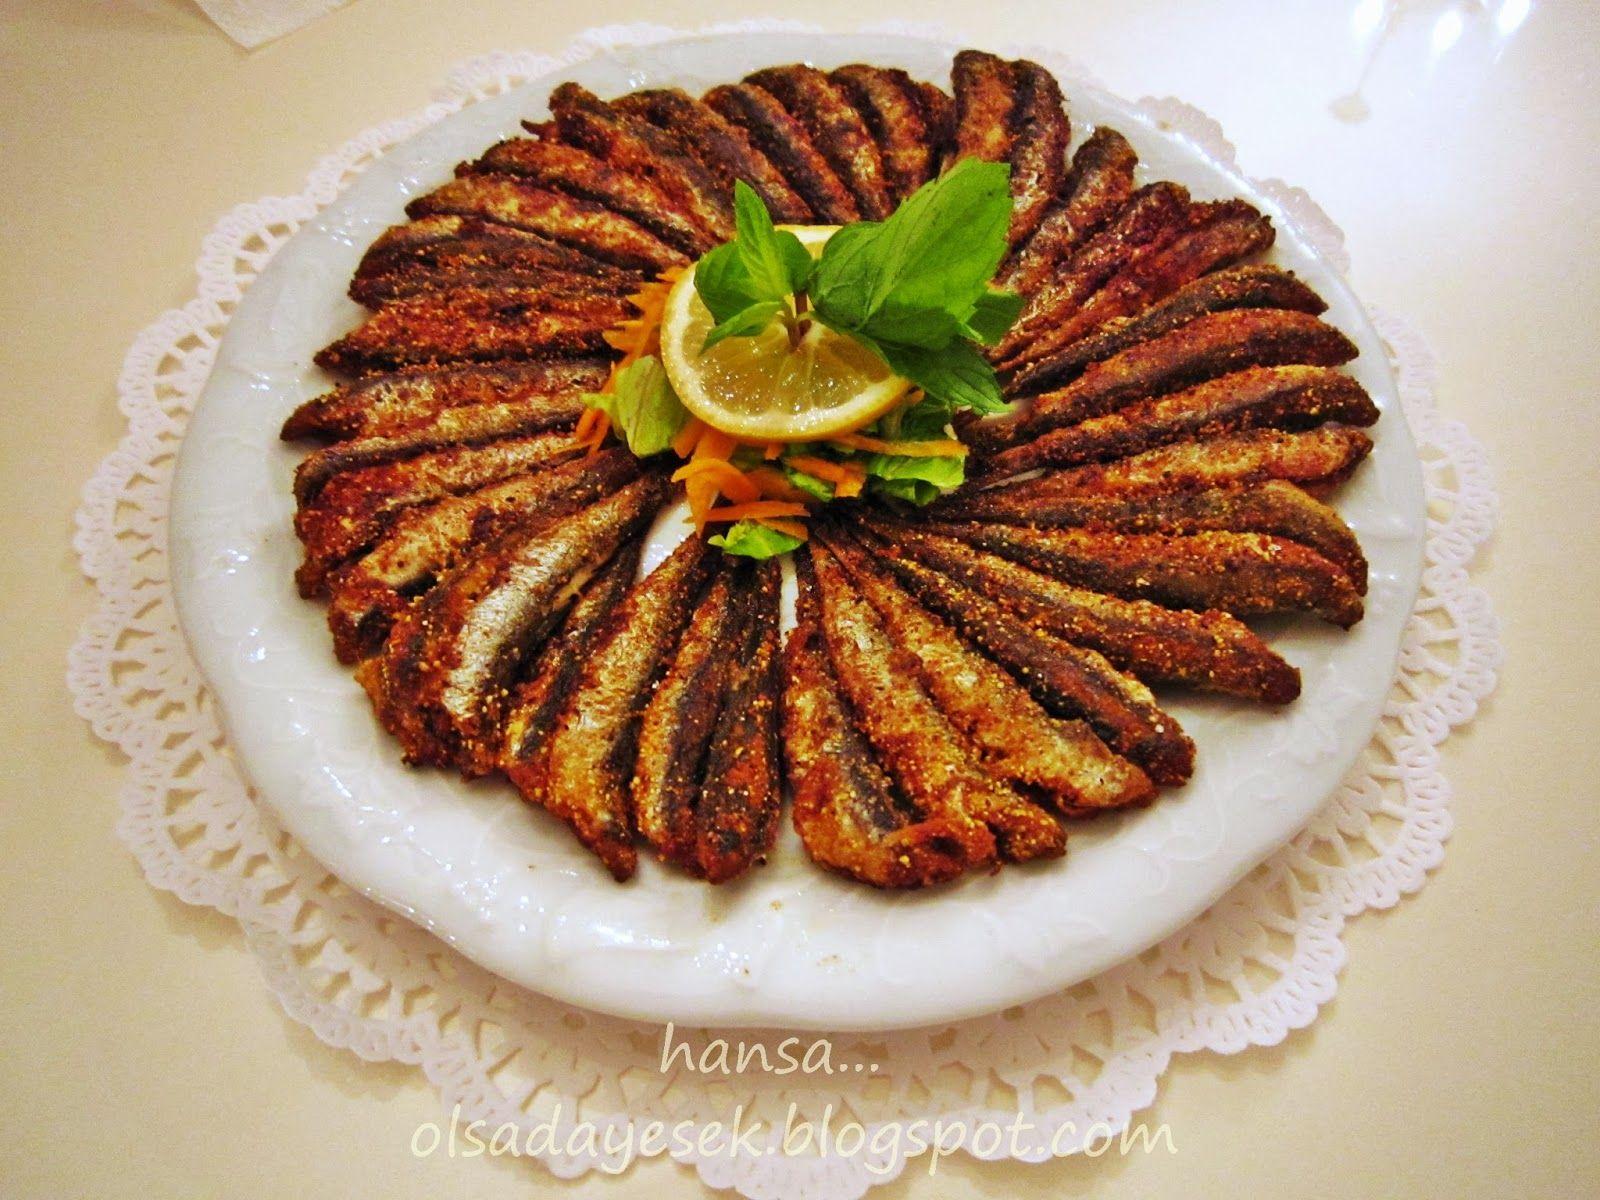 hamsi tava-karadeniz | regional foods | Pinterest